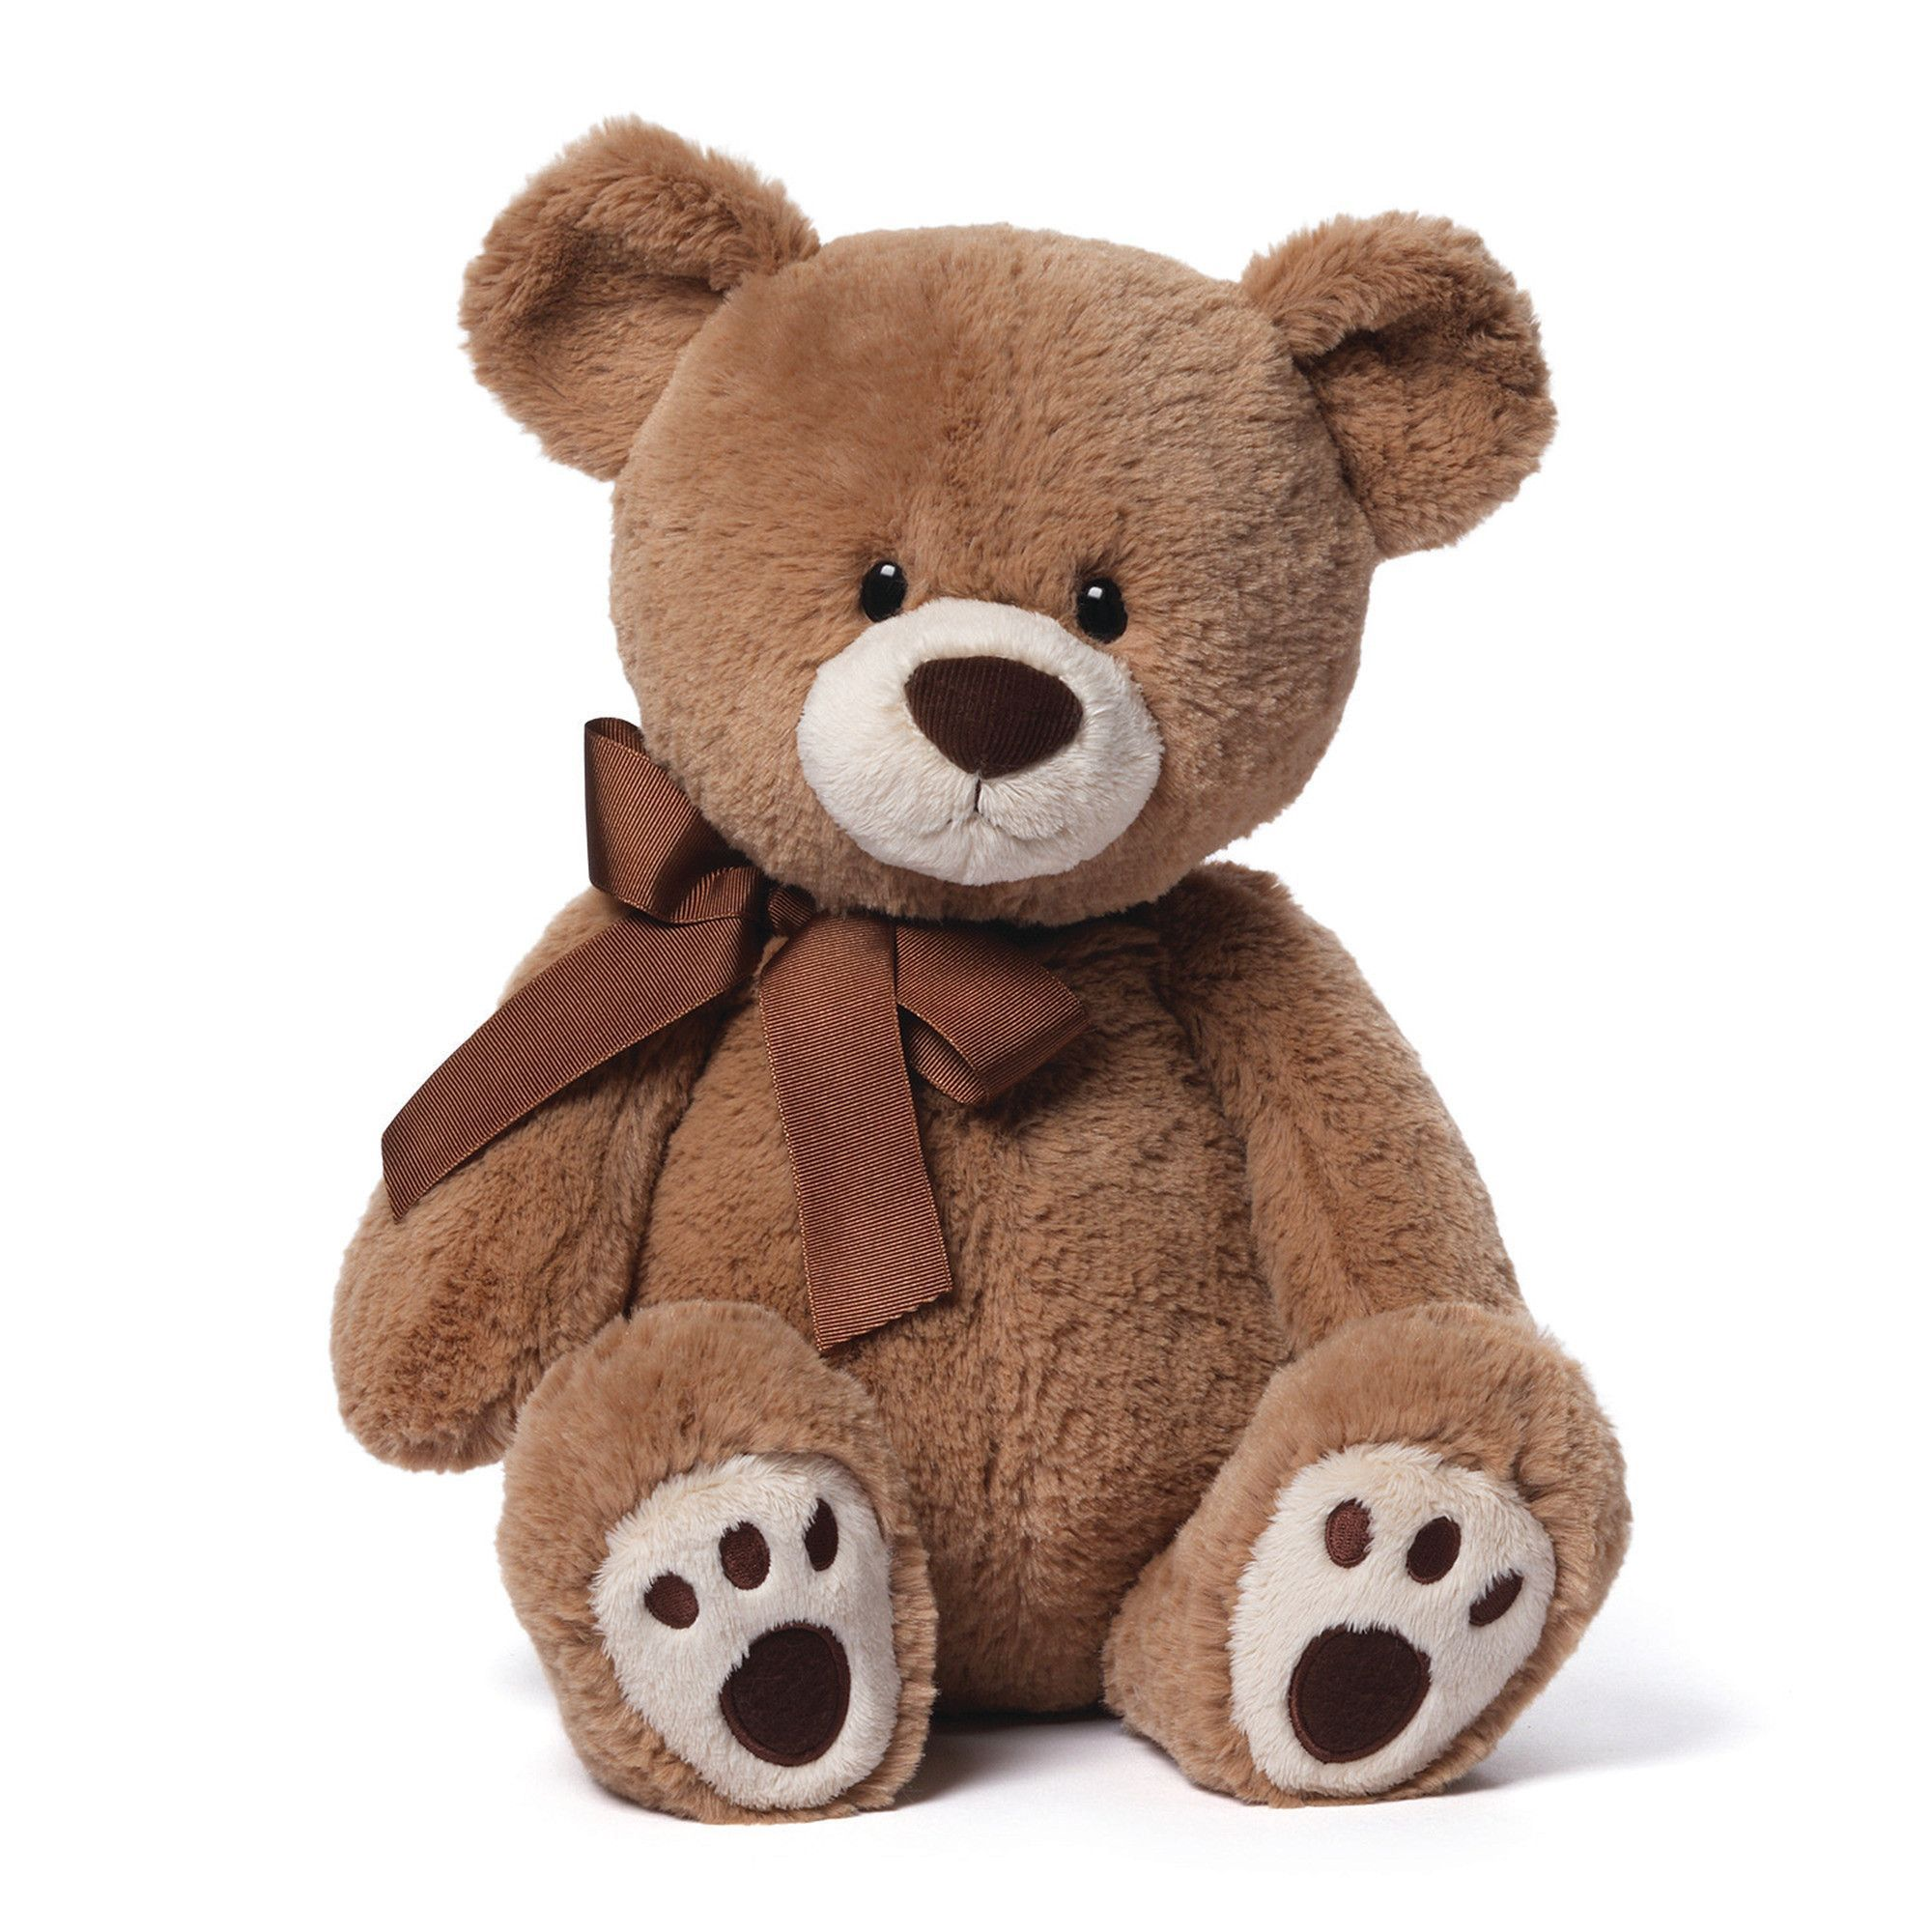 Kiwi, Cuddling And Bears